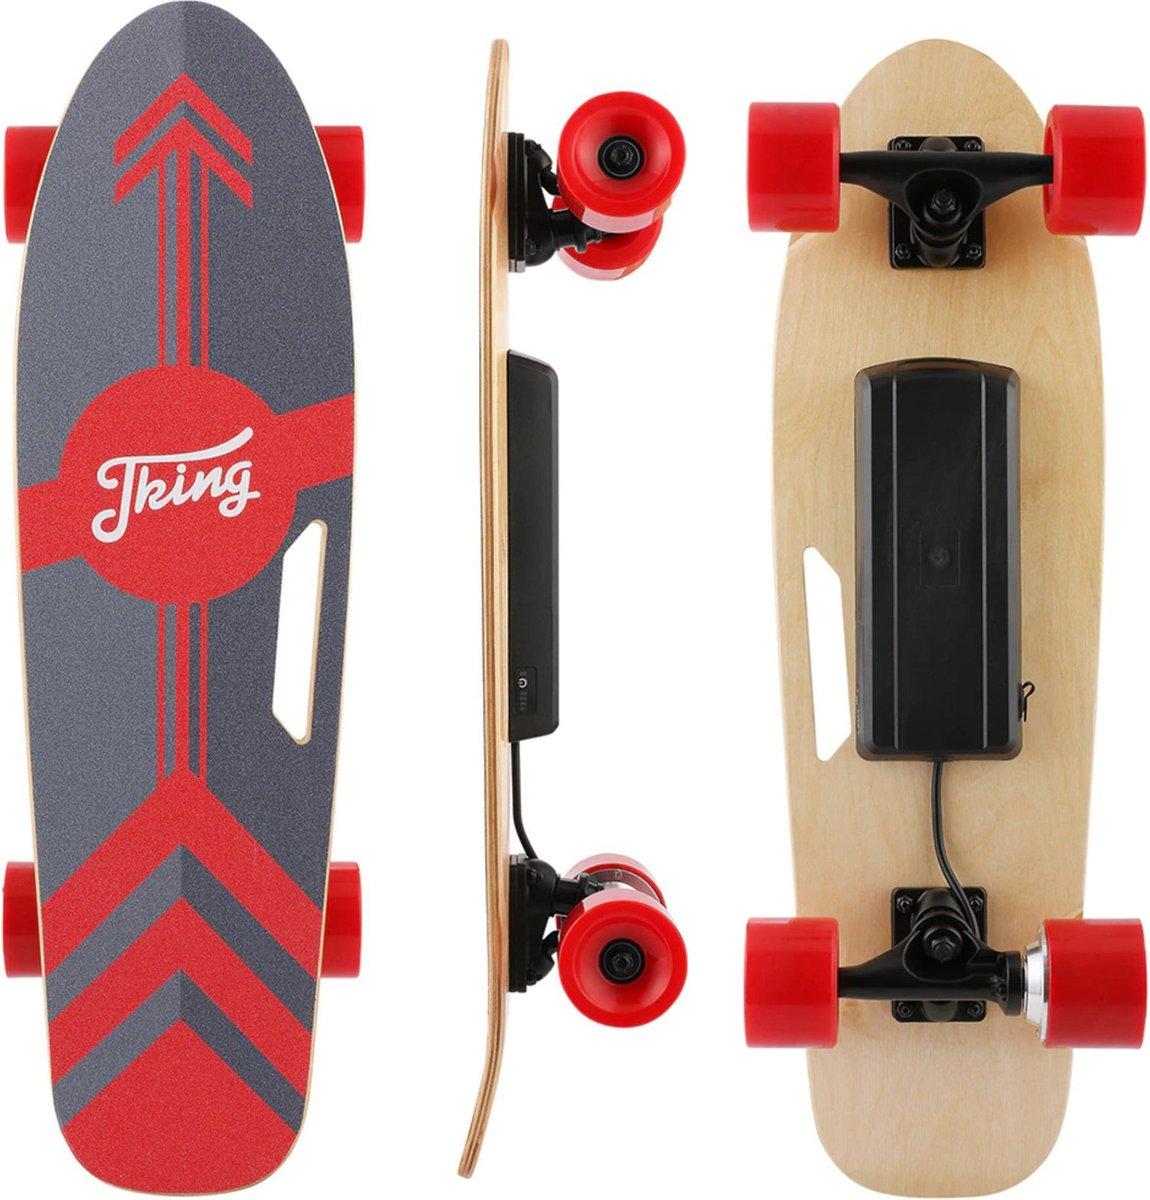 Elektrisch Skateboard - Elektrisch Longboard - Inclusief Controller - 20 km/u - 10km Bereik